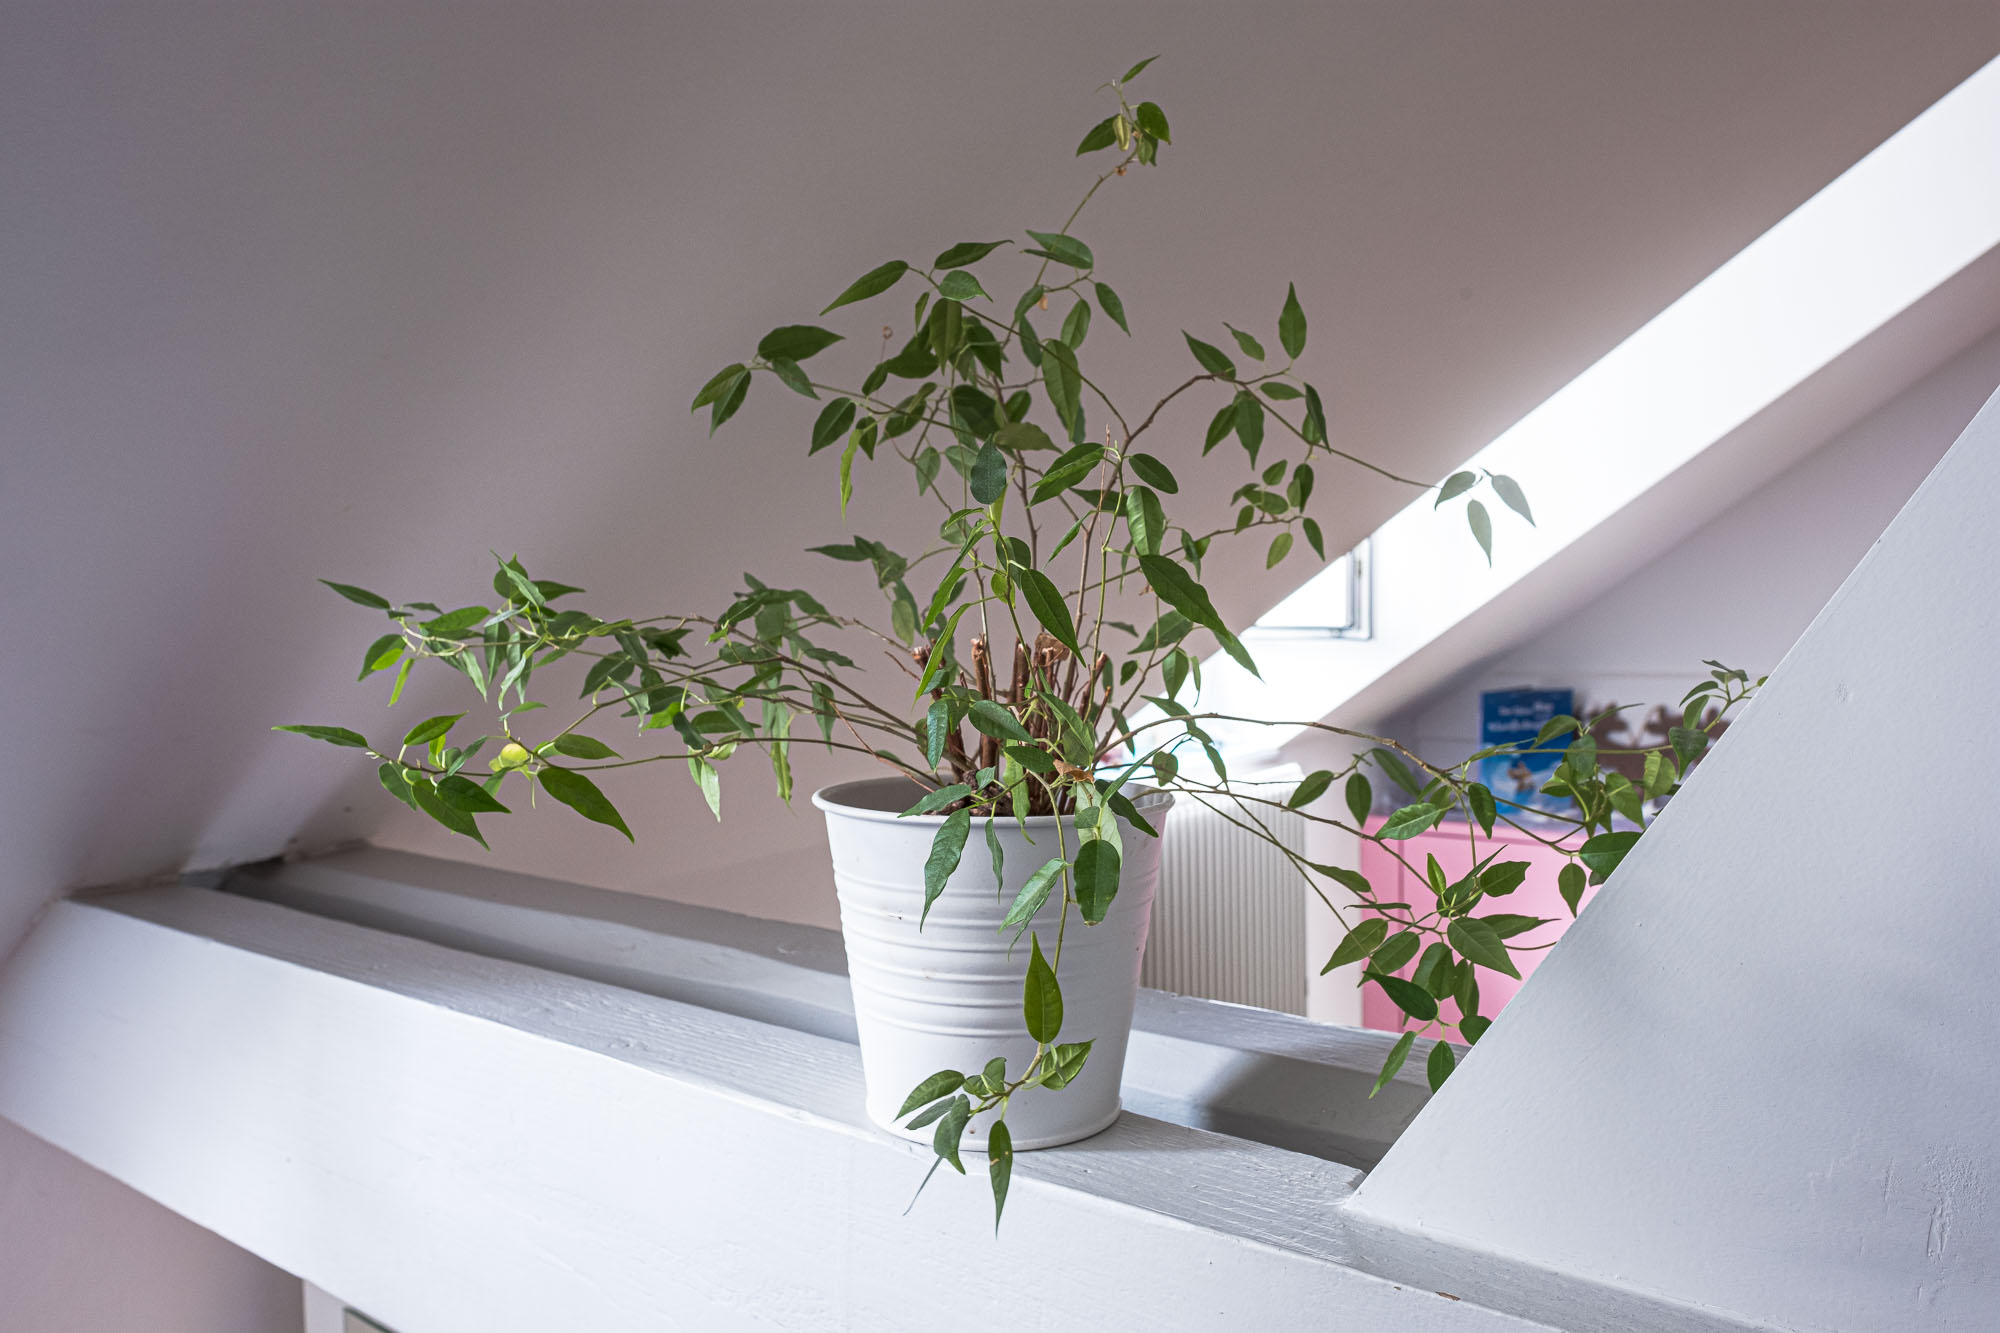 Pflanze im Raum